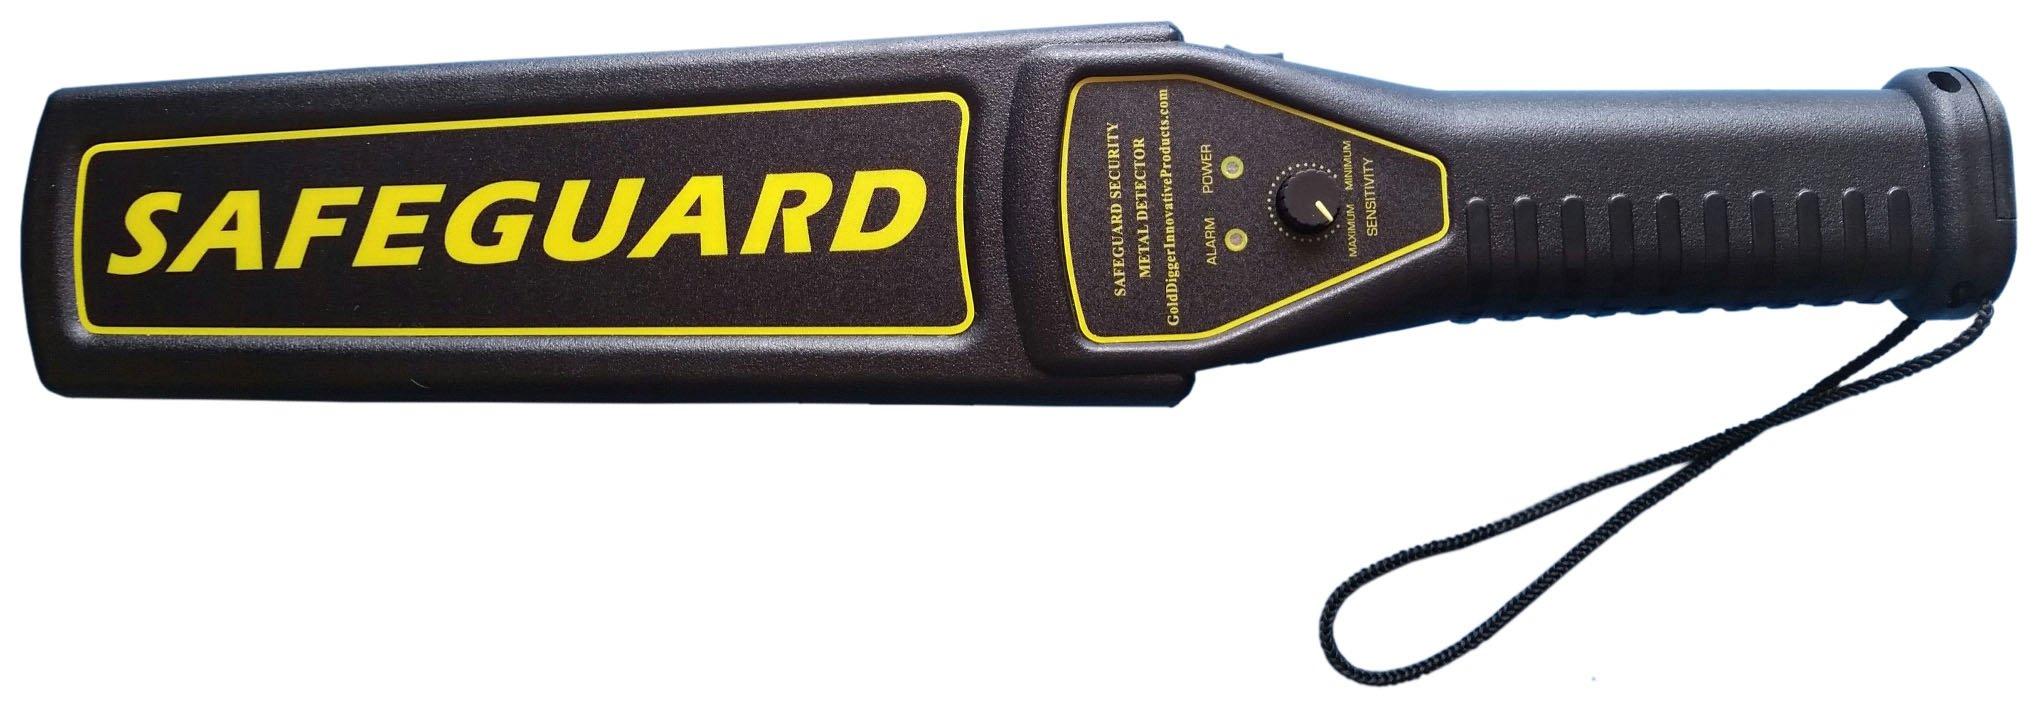 Safeguard Handheld Security Metal Detector